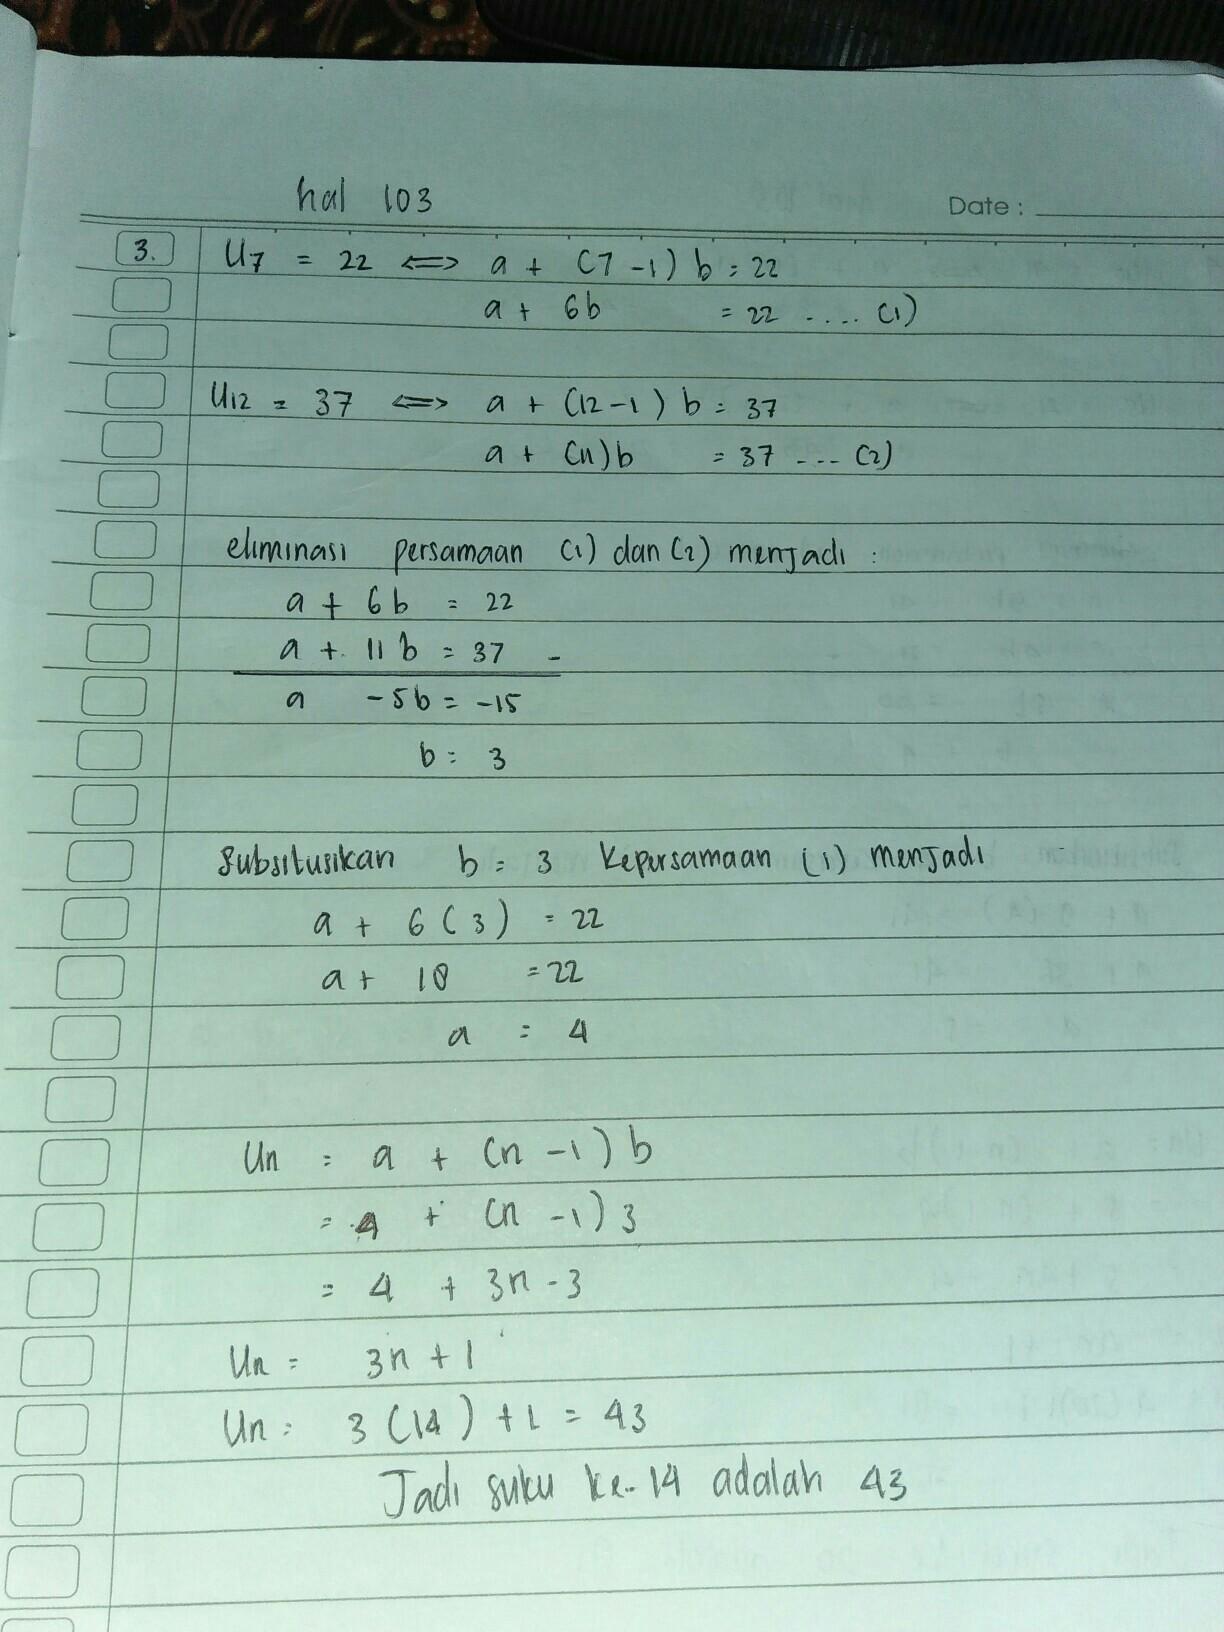 Berikan 2 Contoh Soal Deret Aritmatika Beserta Jawabannya Brainly Co Id